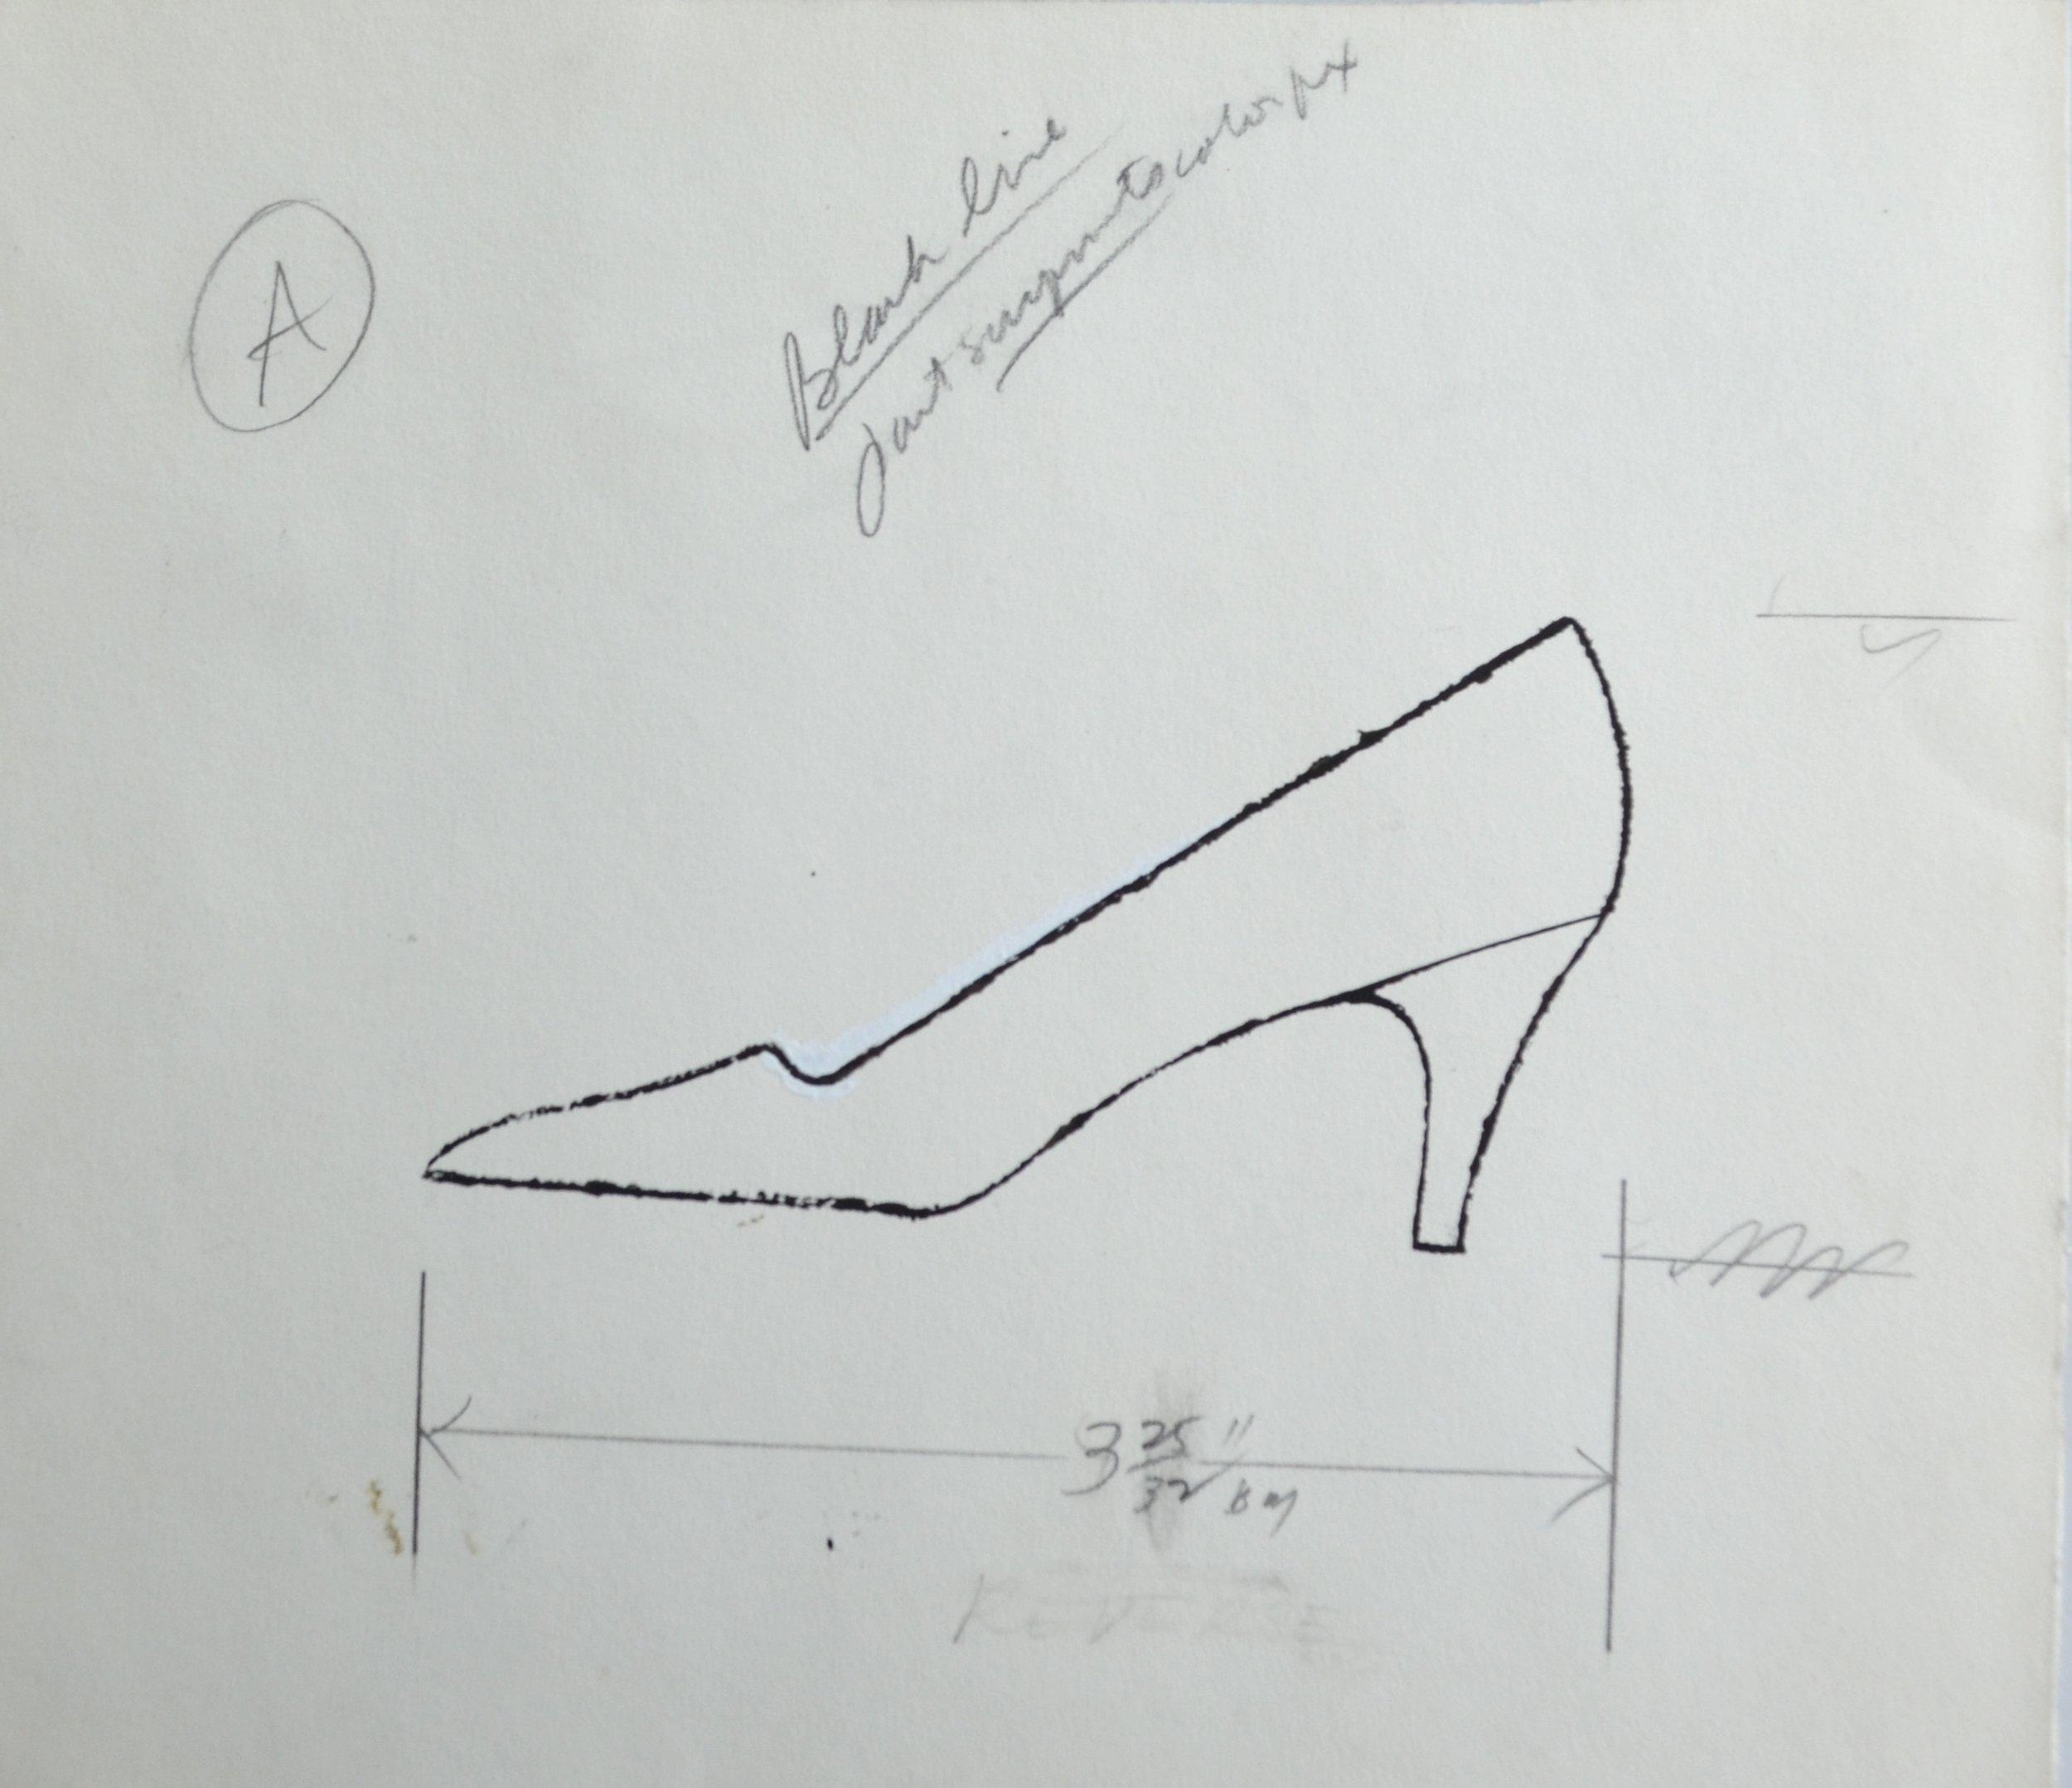 Andy Warhol - Shoe (Circa 1954) - Additional Information